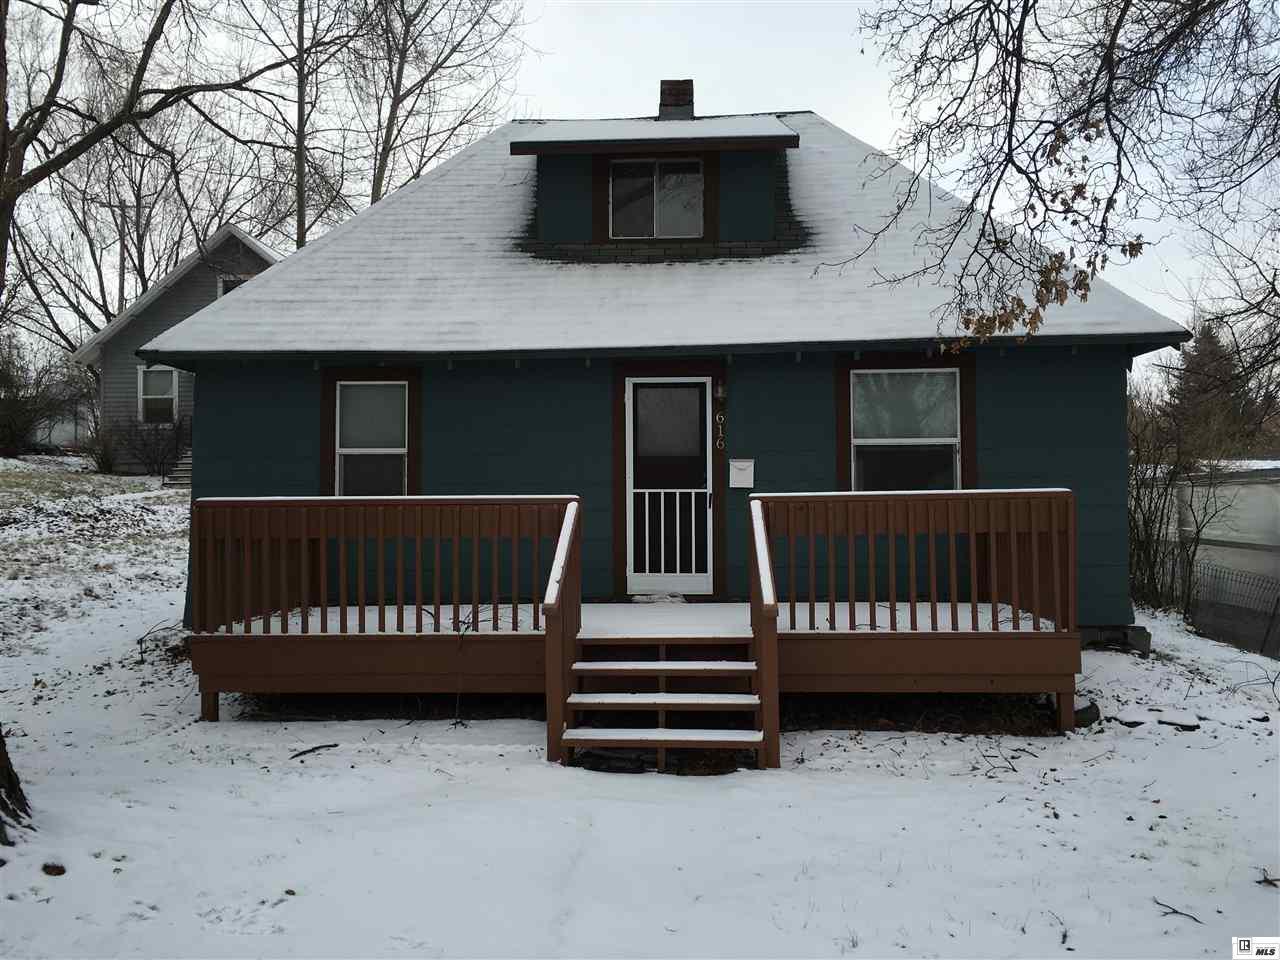 616 N Jefferson, Moscow, Idaho 83843